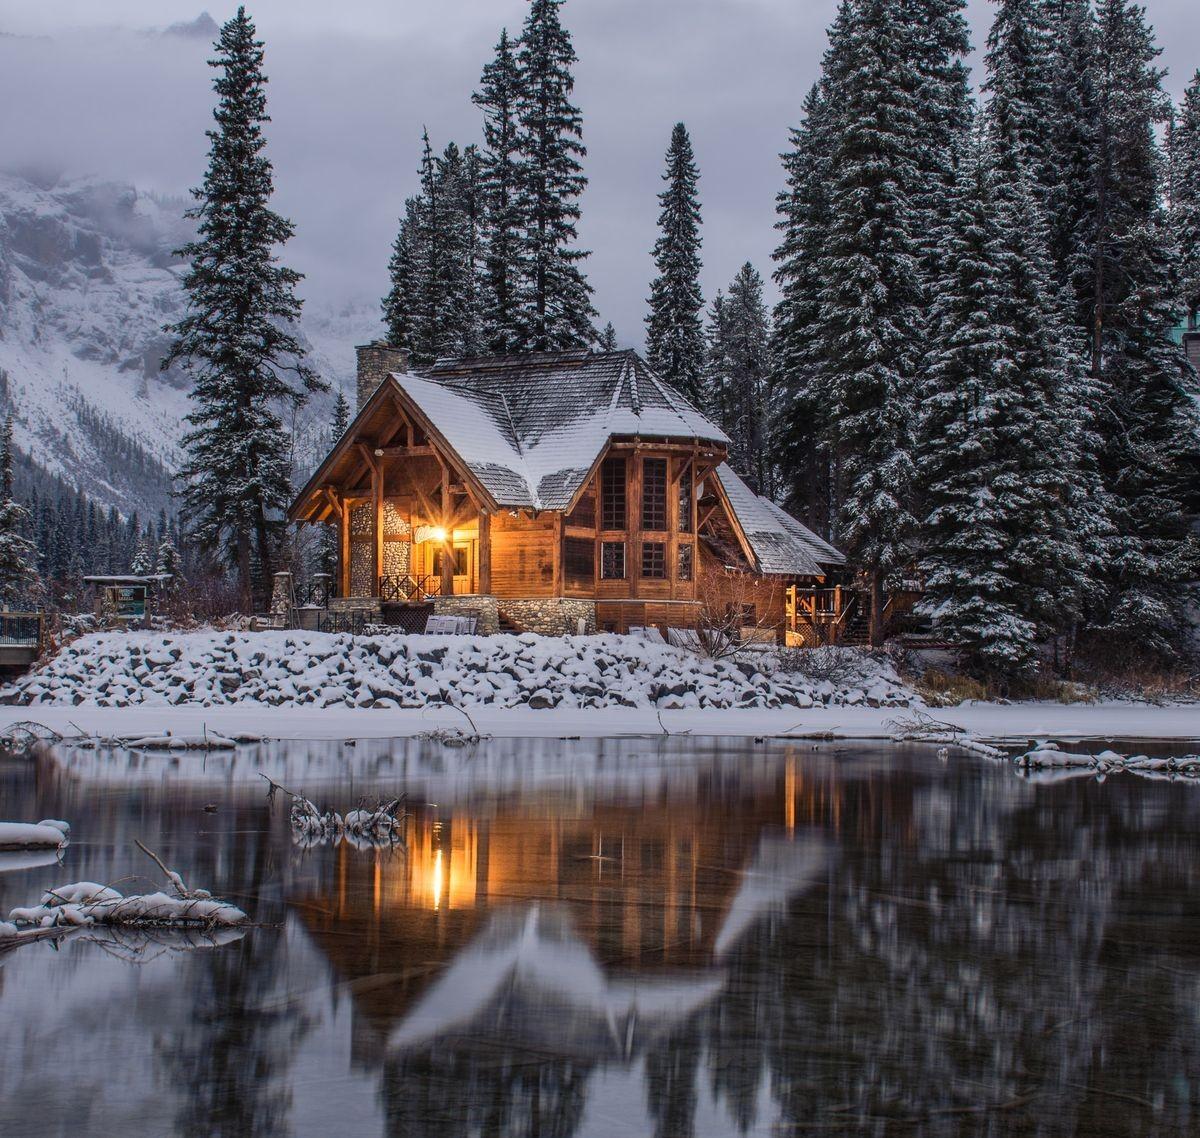 Rompecabezas Recoger rompecabezas en línea - The house on the lake